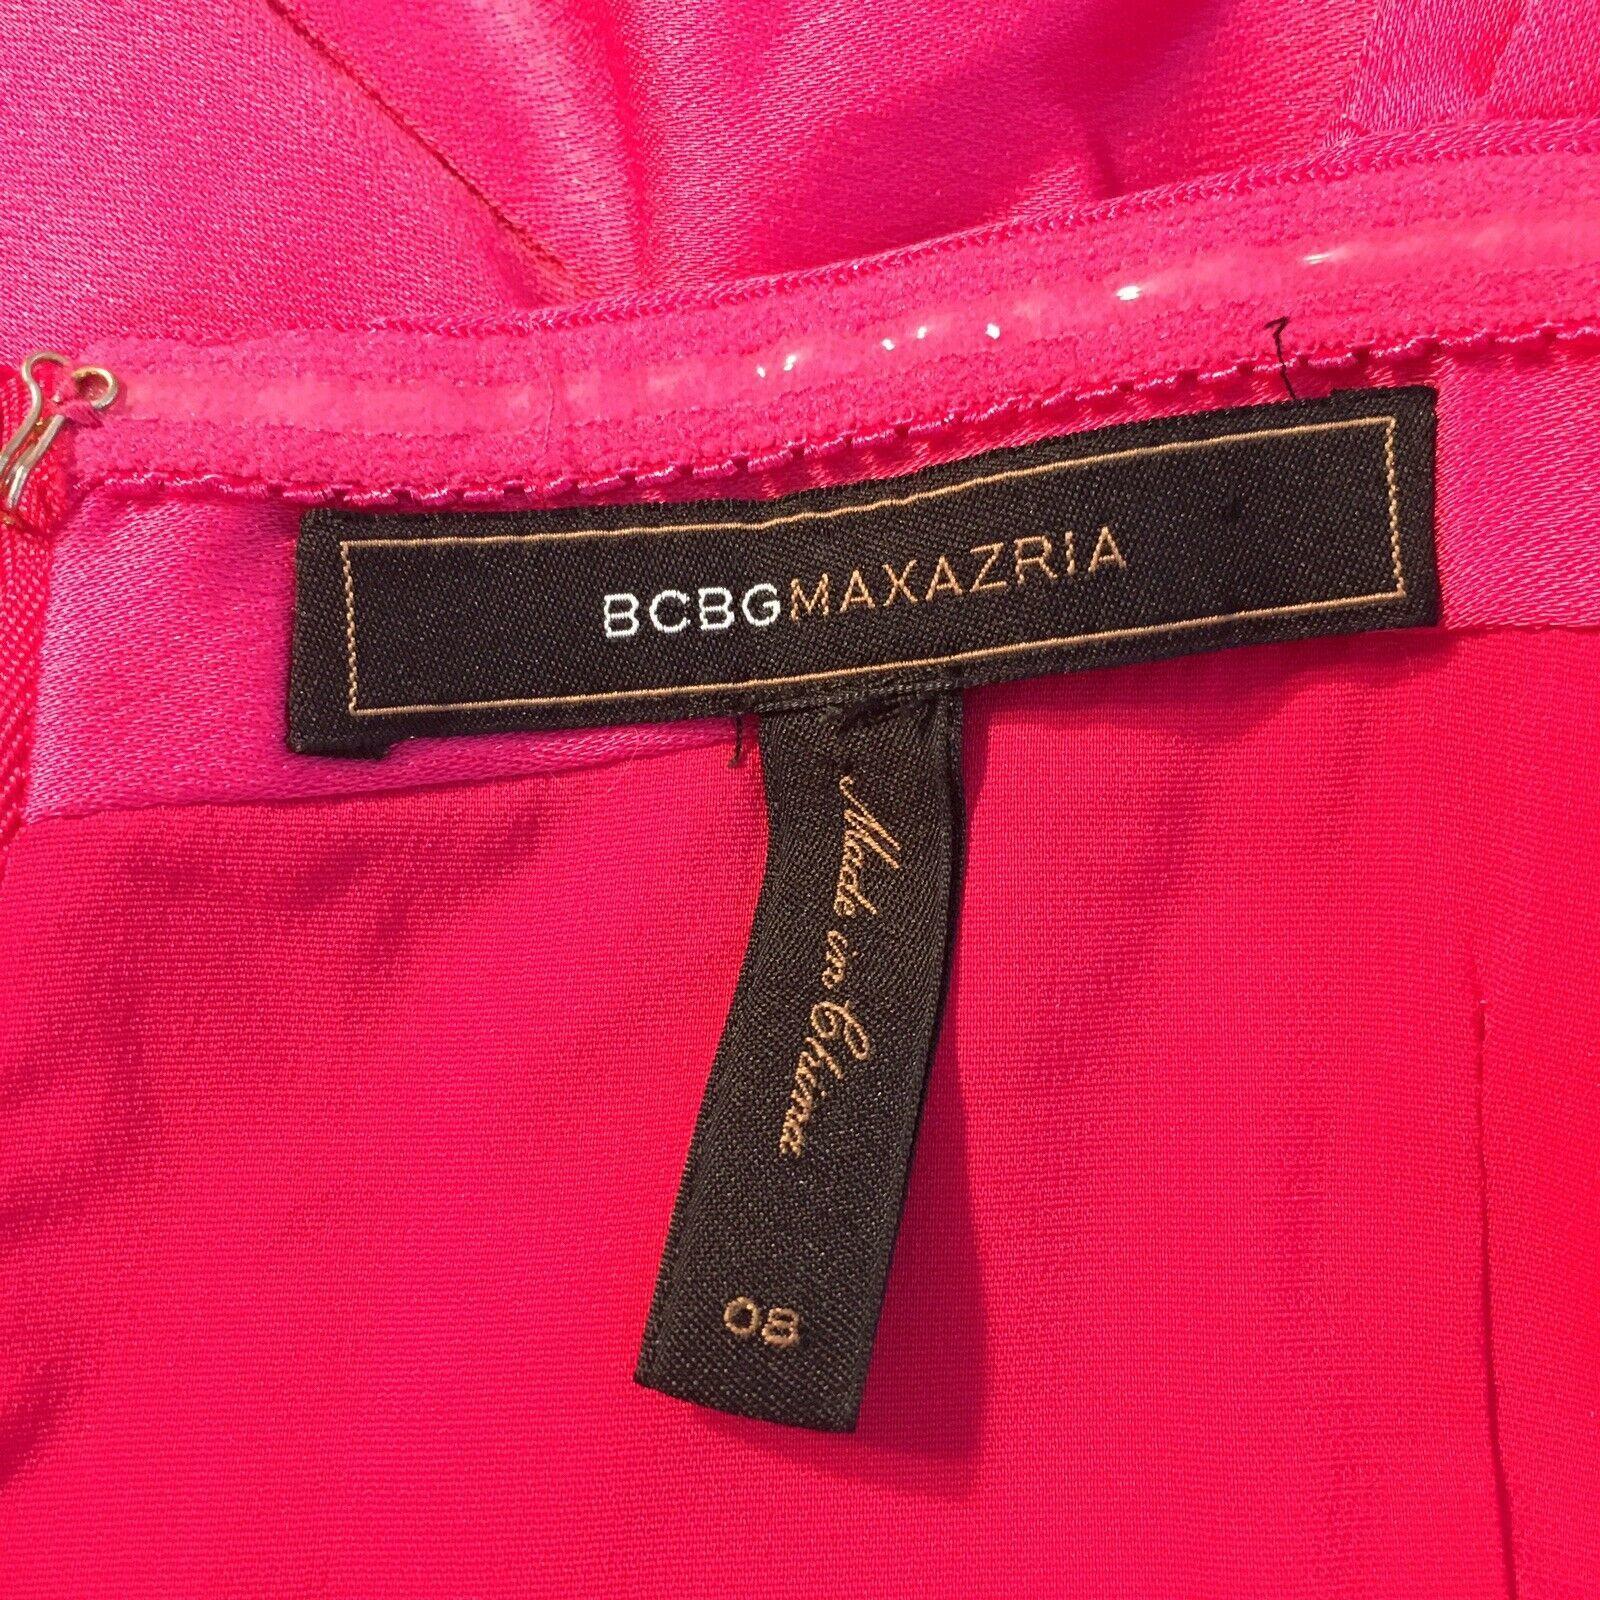 BCBG Max Azria Women's Pink One Shoulder Formal Cocktail Dress Size 8